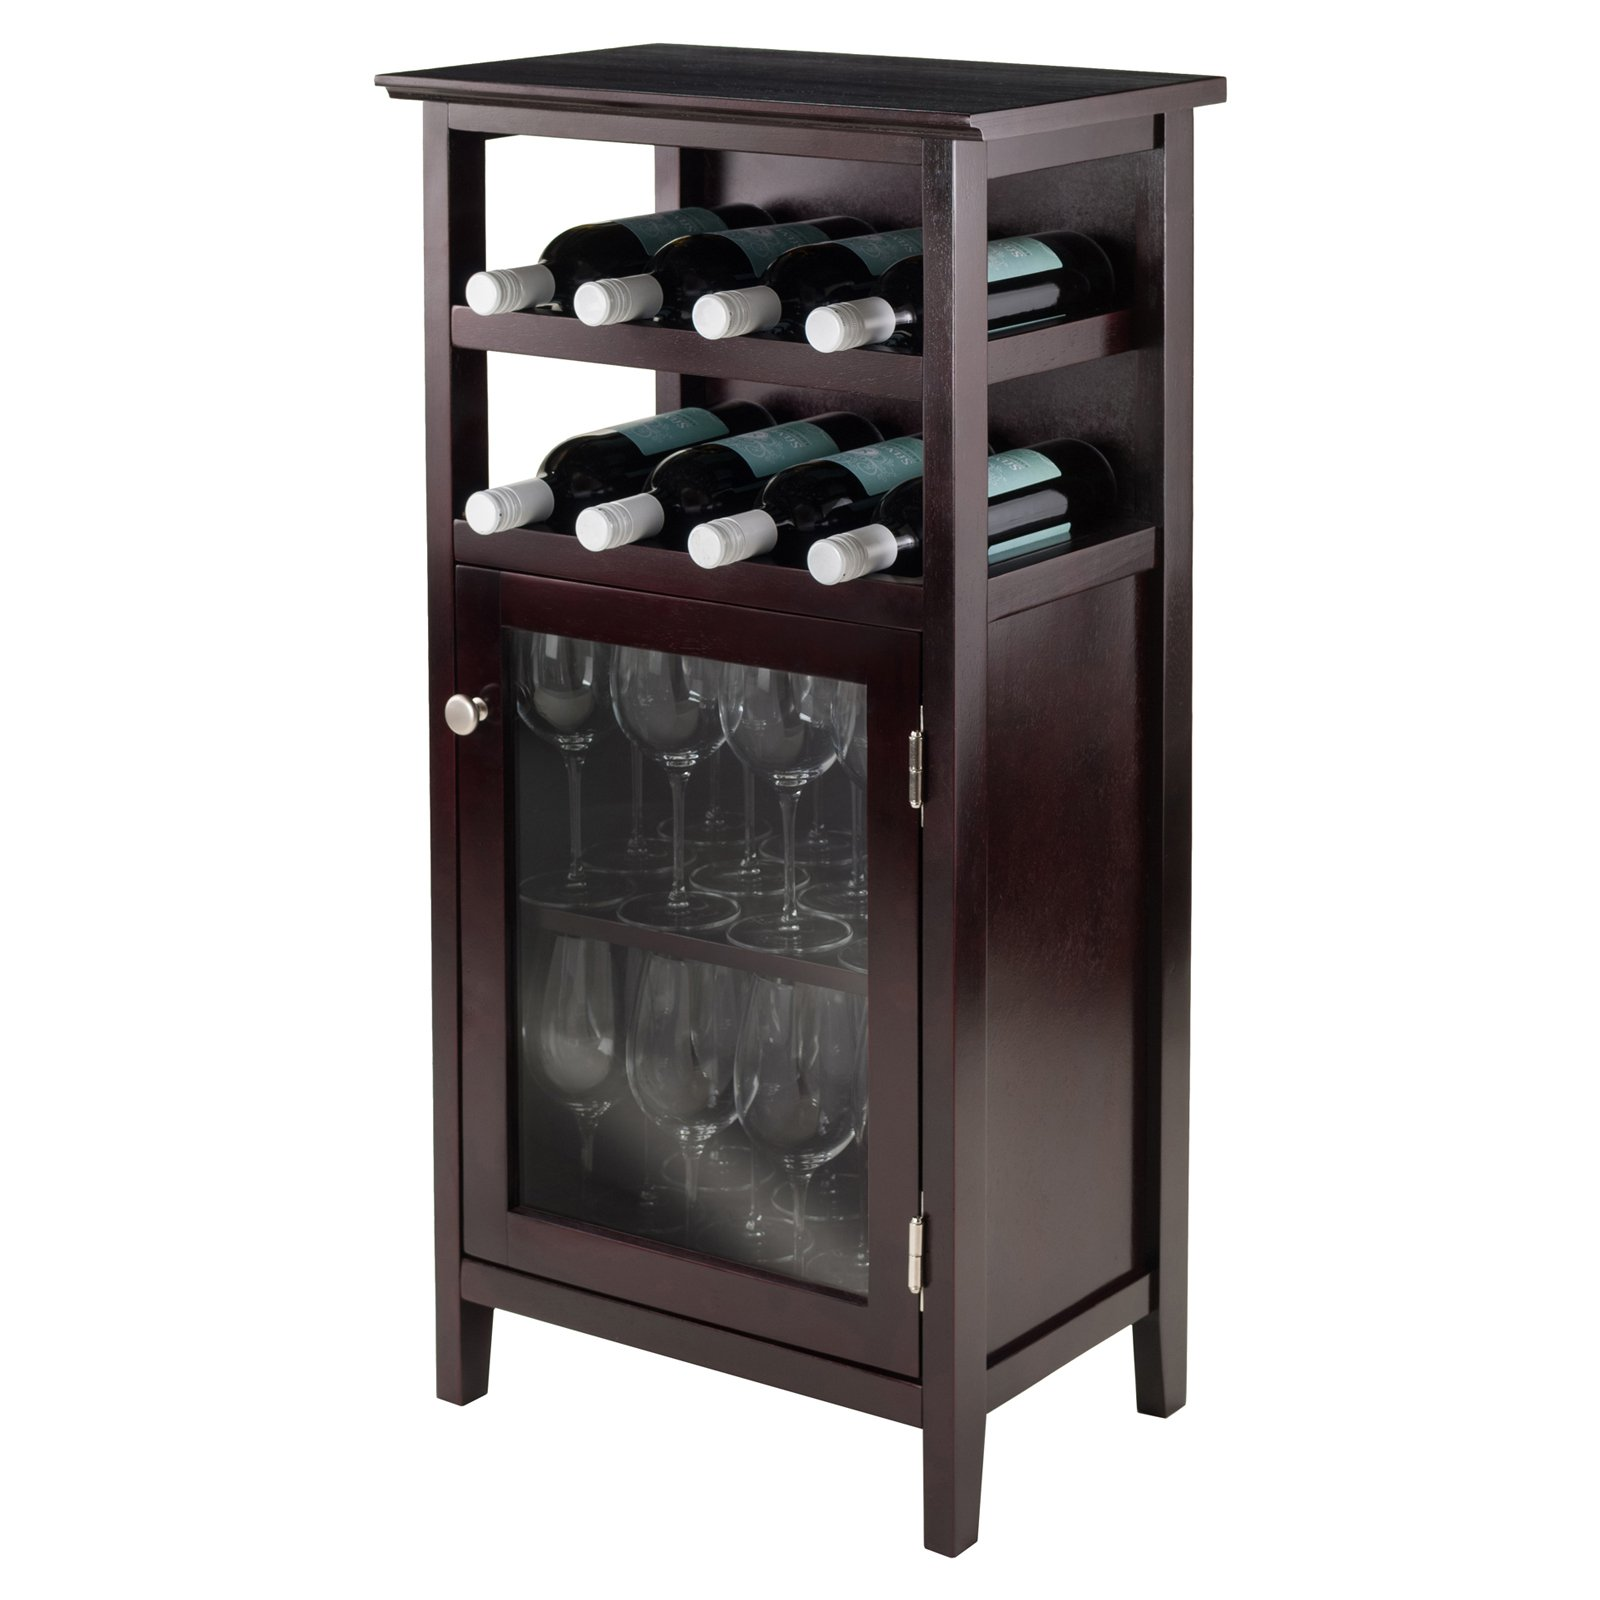 Winsome Wood Alta Display Wine Cabinet Espresso Finish